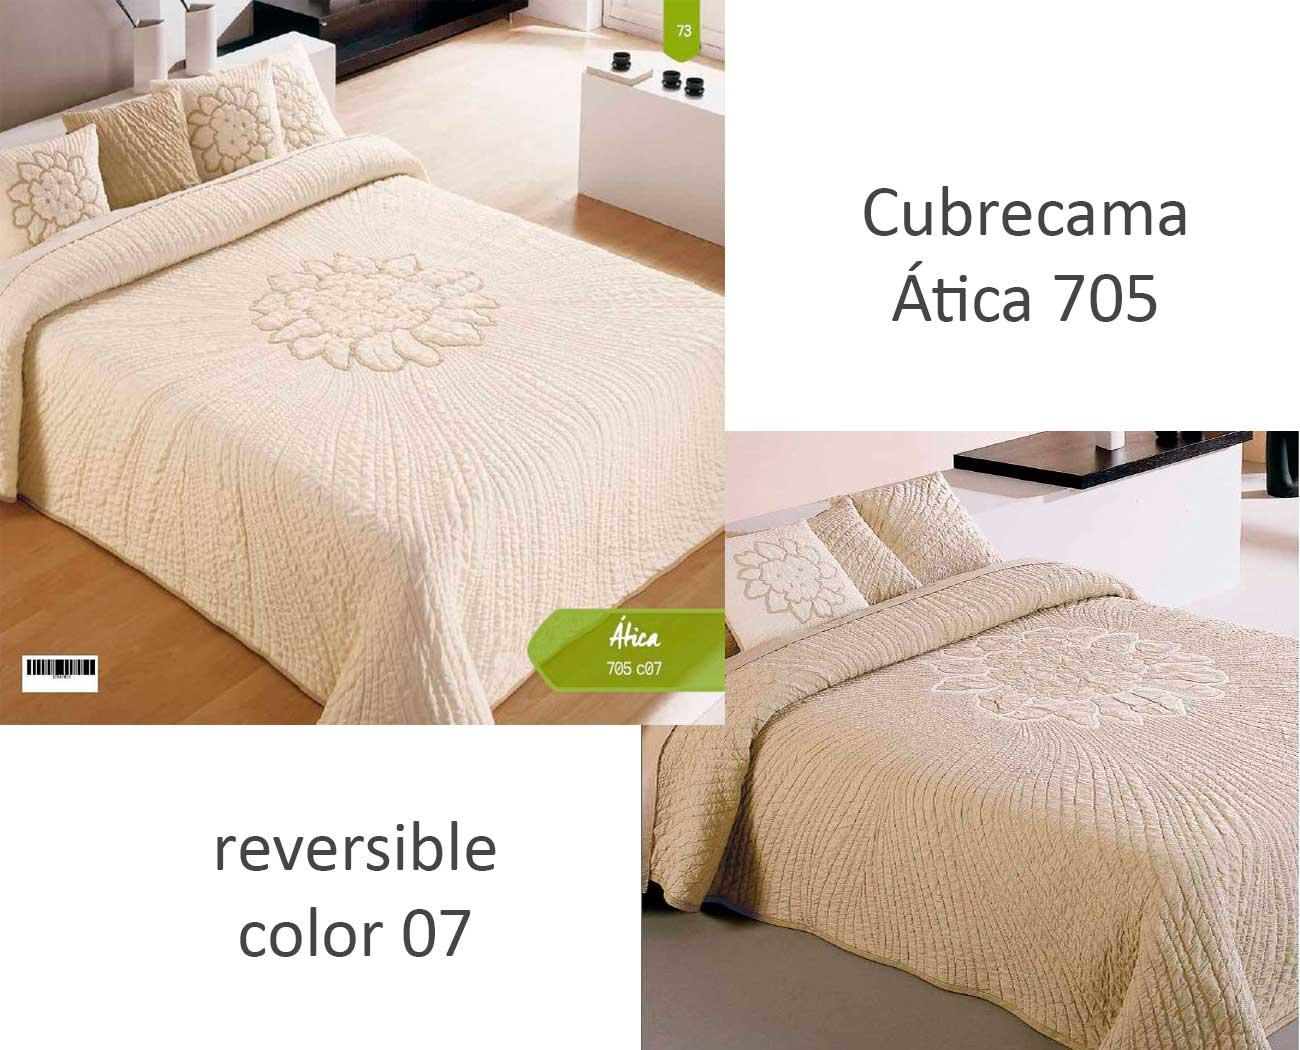 CUBRECAMA ATICA 705